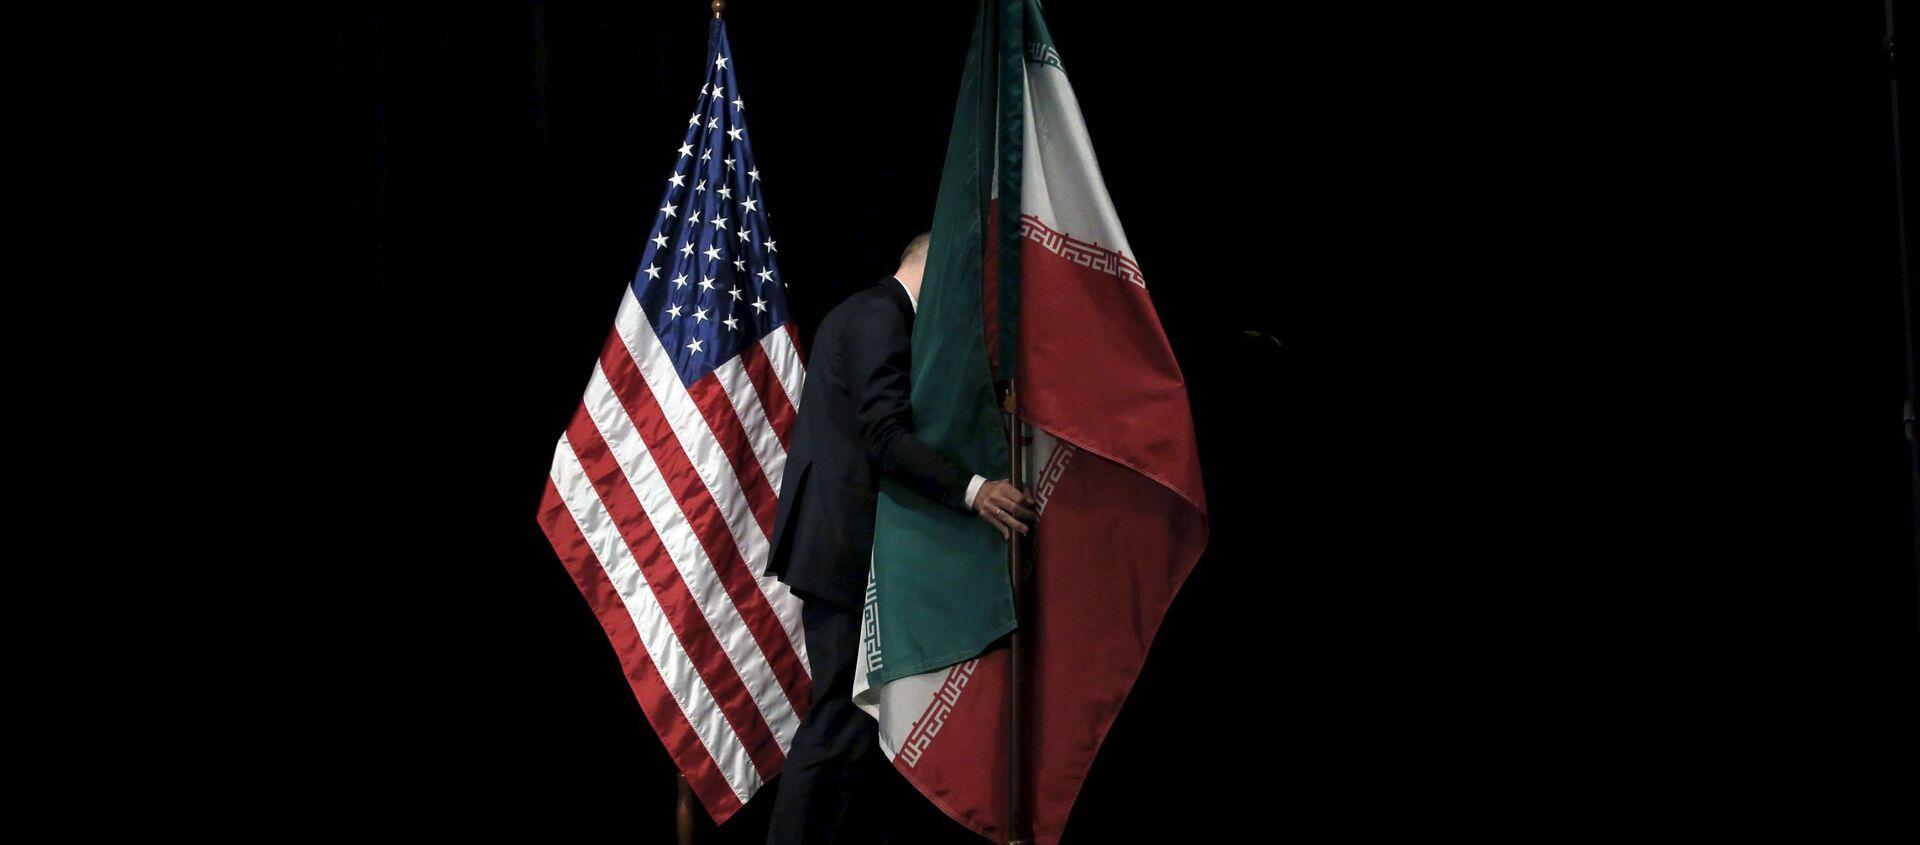 Flagi USA i Iranu w Wiedniu - Sputnik Polska, 1920, 24.12.2020